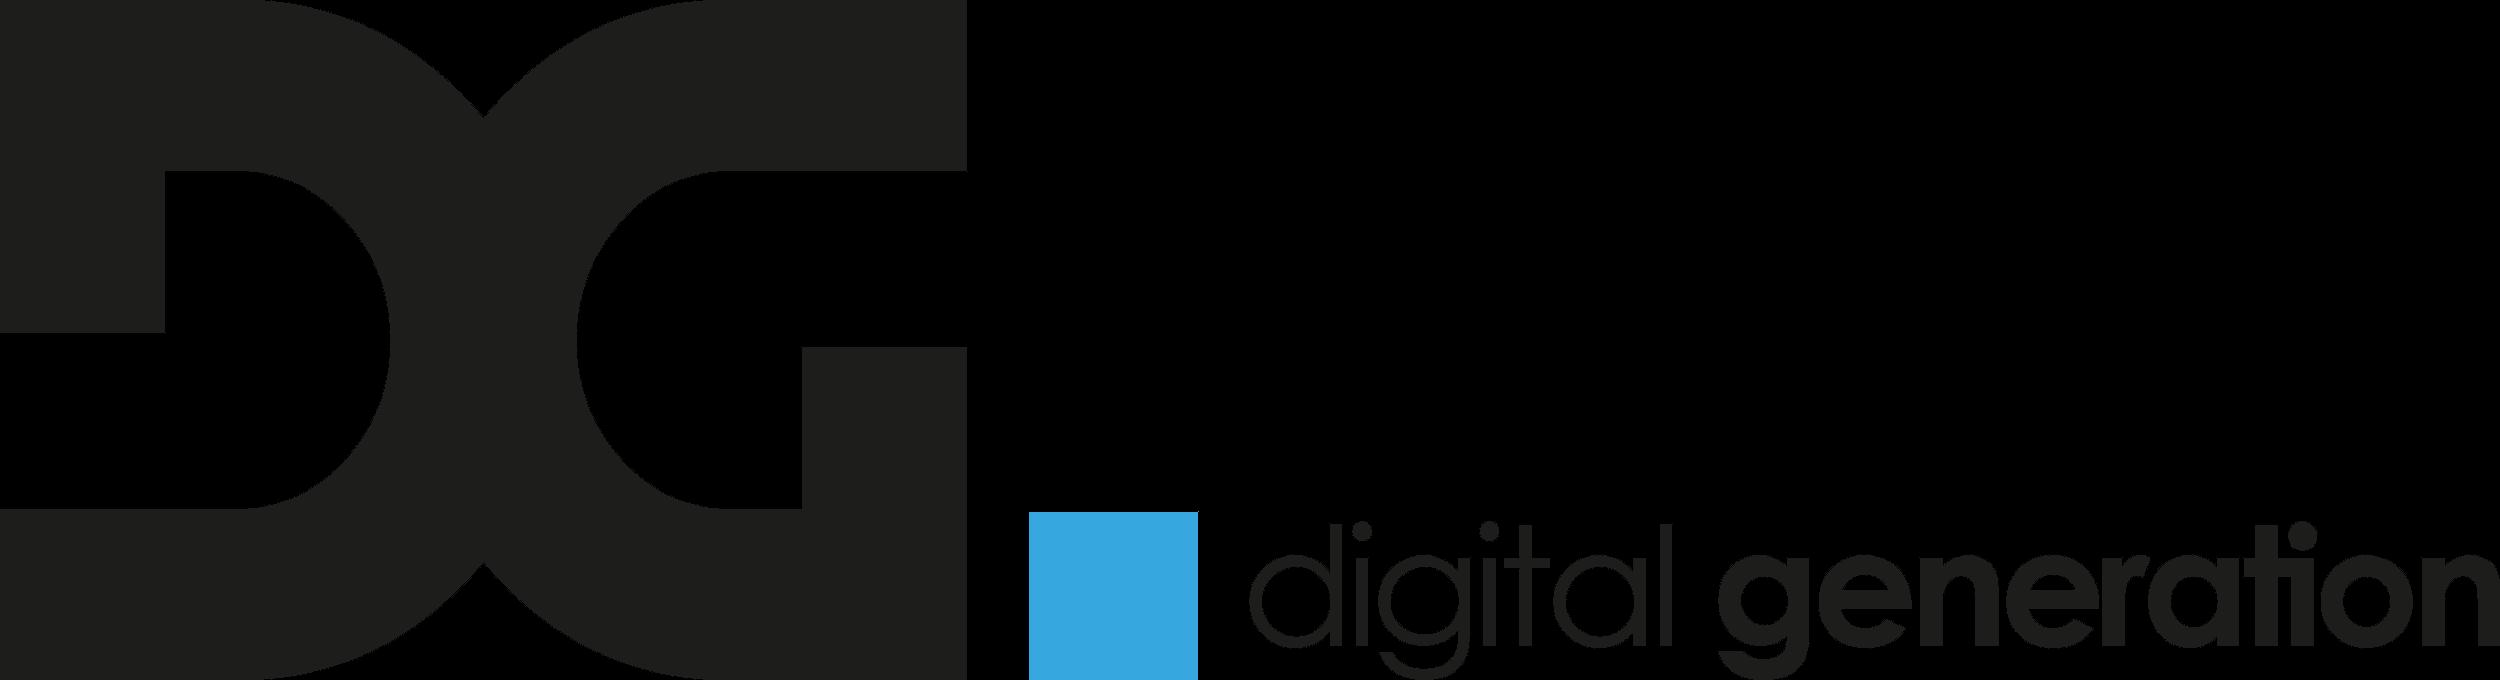 Home - DG - Digital Generation